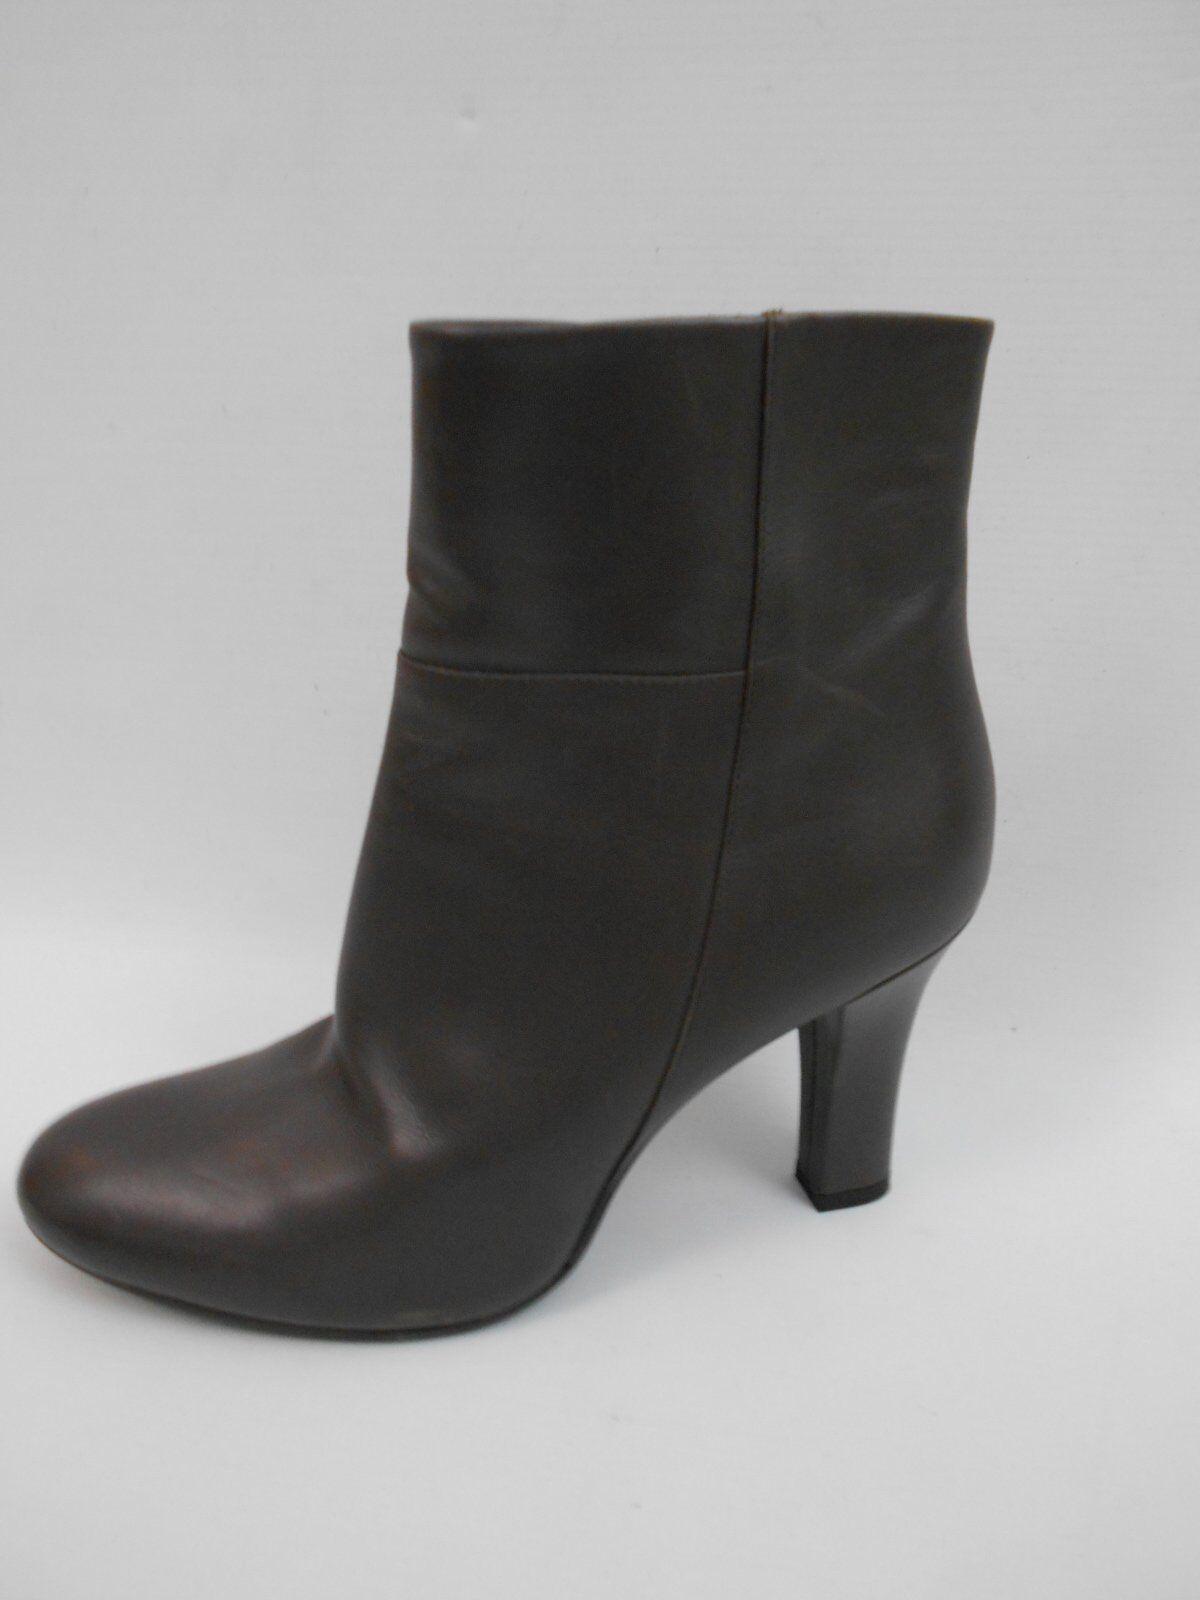 Zapatos especiales con descuento Max Mara Schuhe Stiefeletten Boots Shoes Braungrau Gr.37 Elegant Top